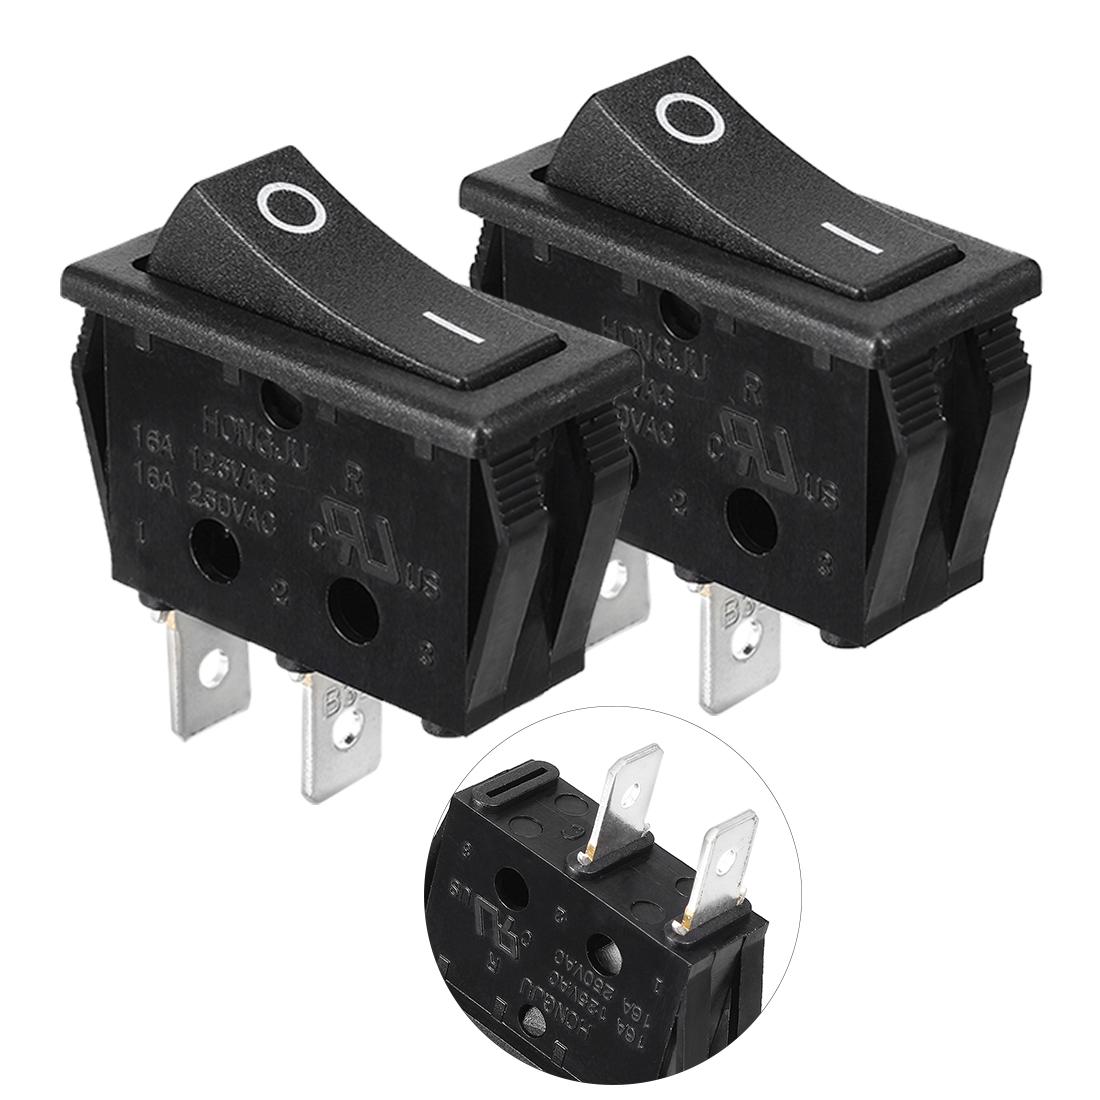 2x AC 6A/250V 10A/125V ON/OFF I/O SPST 2 Pin Snap in Rocker Switch Black 20x12mm